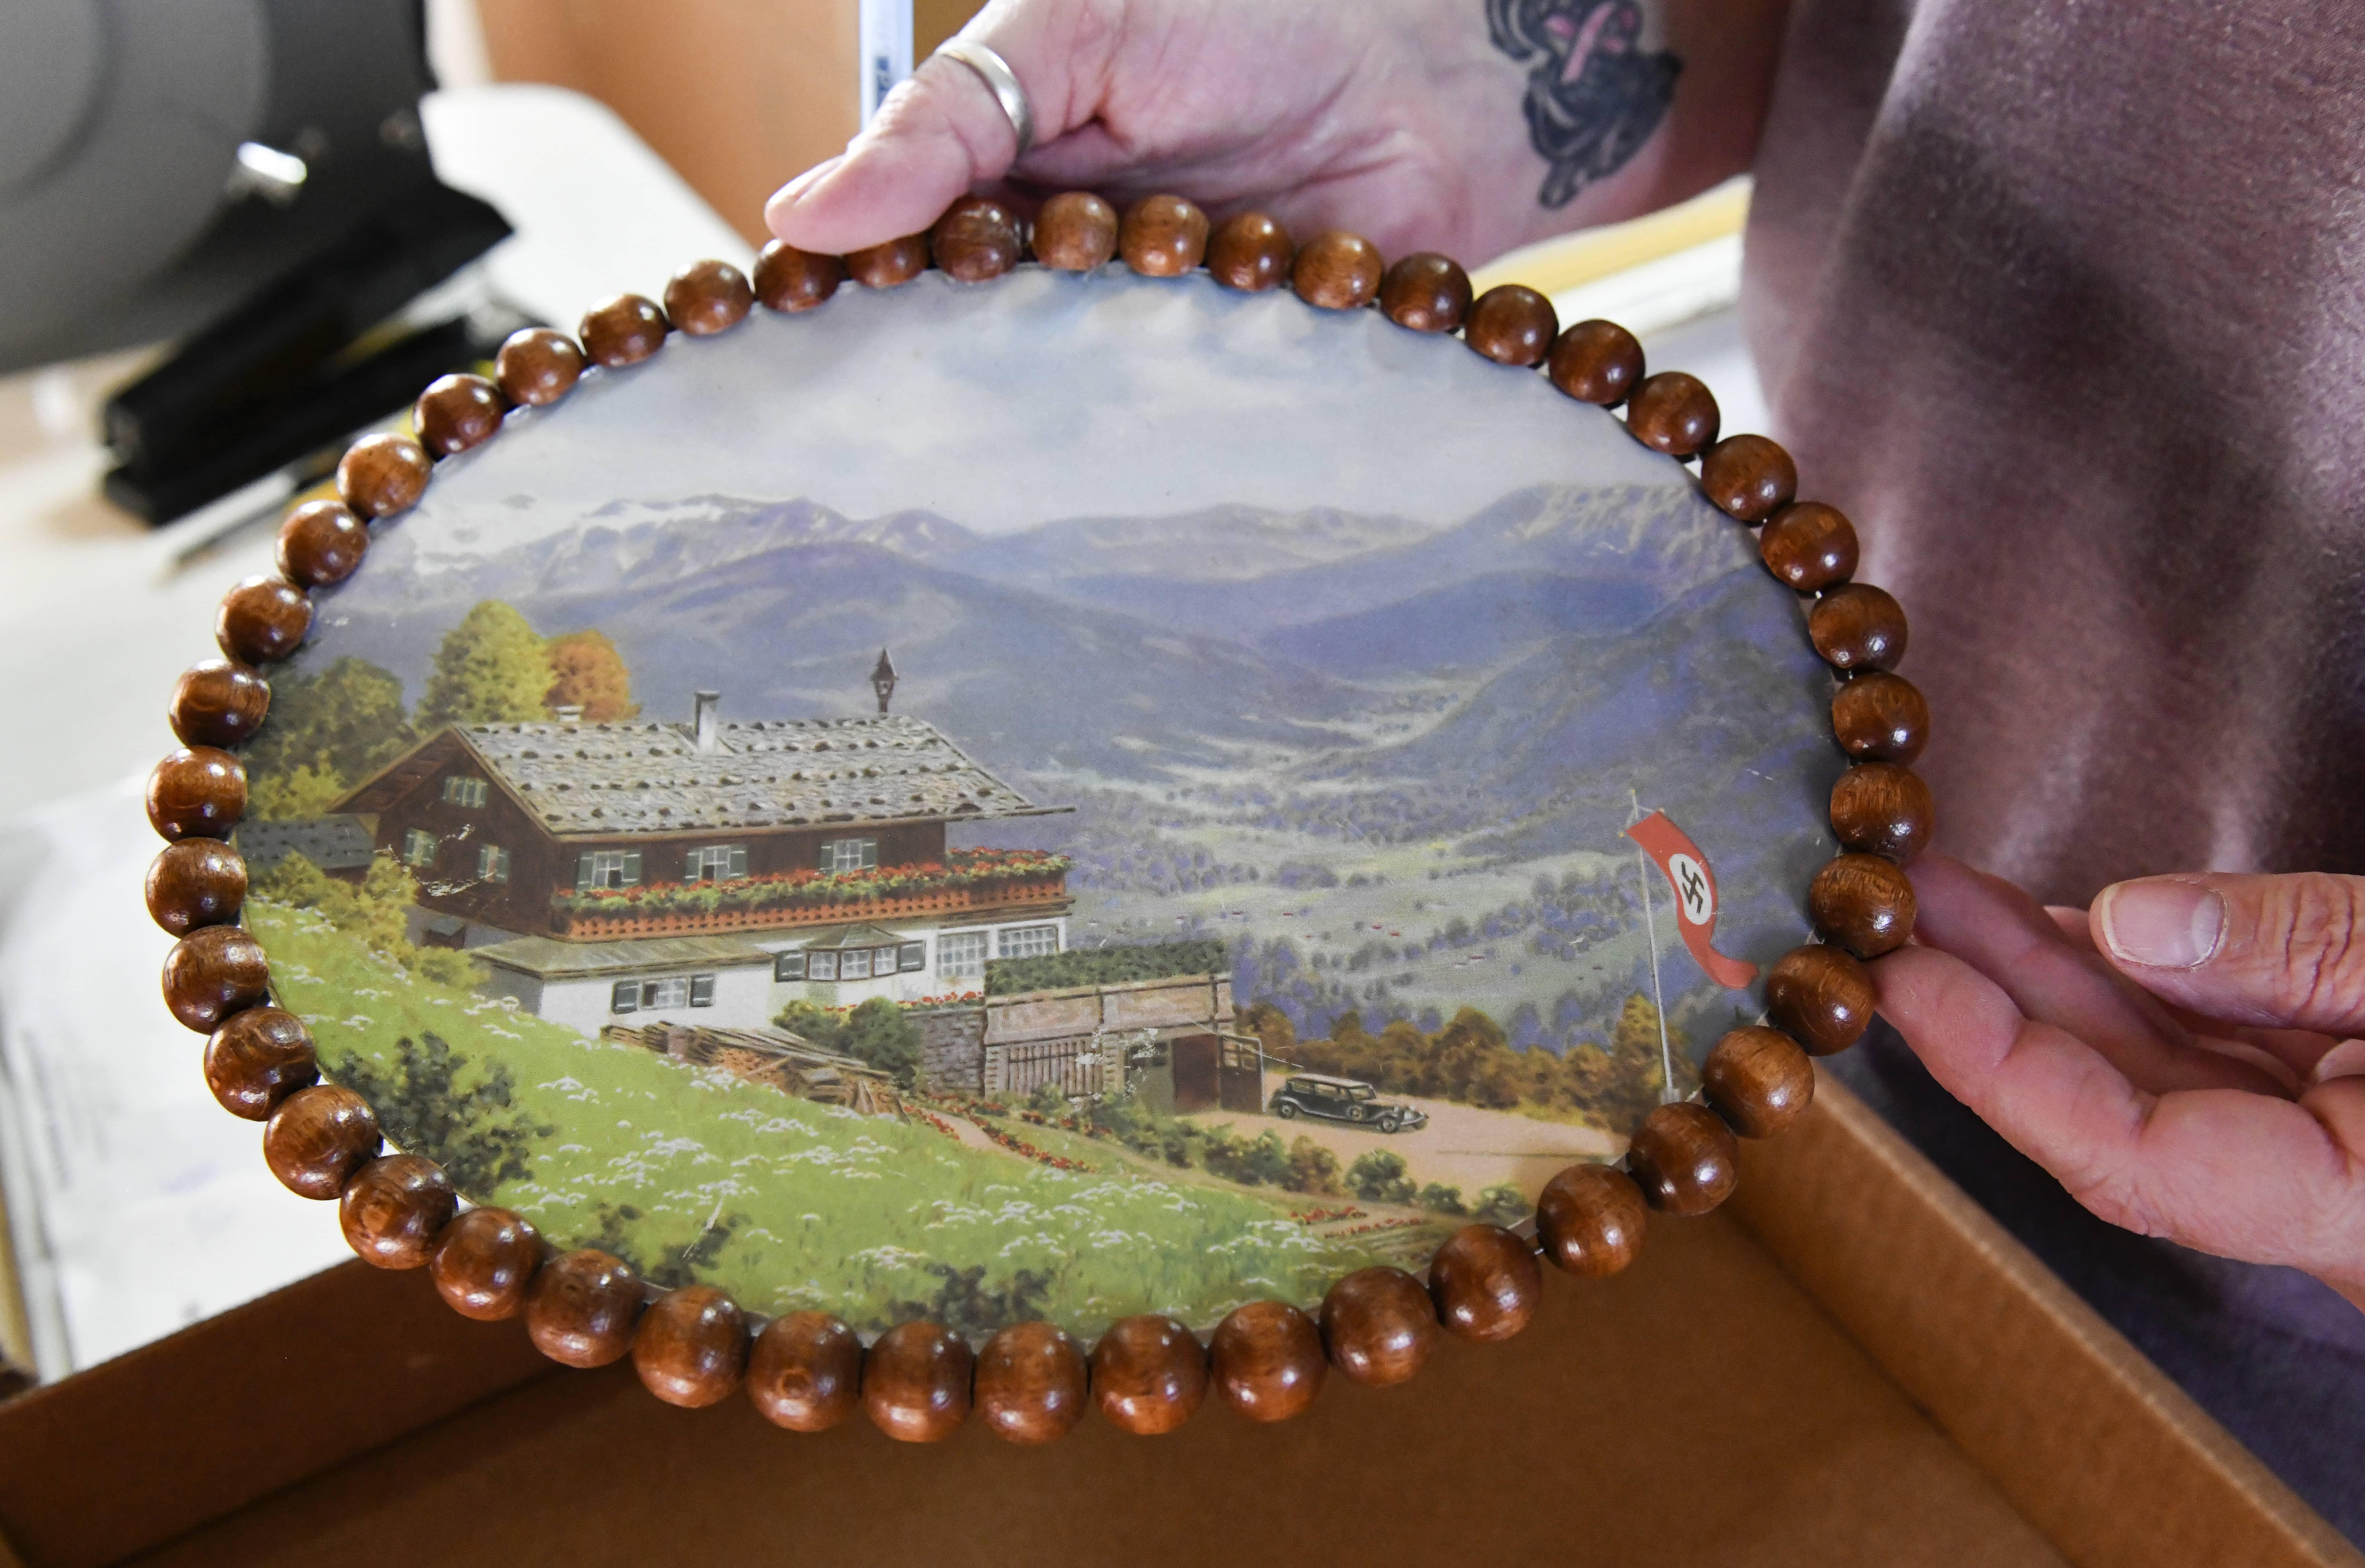 Photo of a souvenir print depicting the Berghof, Adolf Hitler's mountain retreat